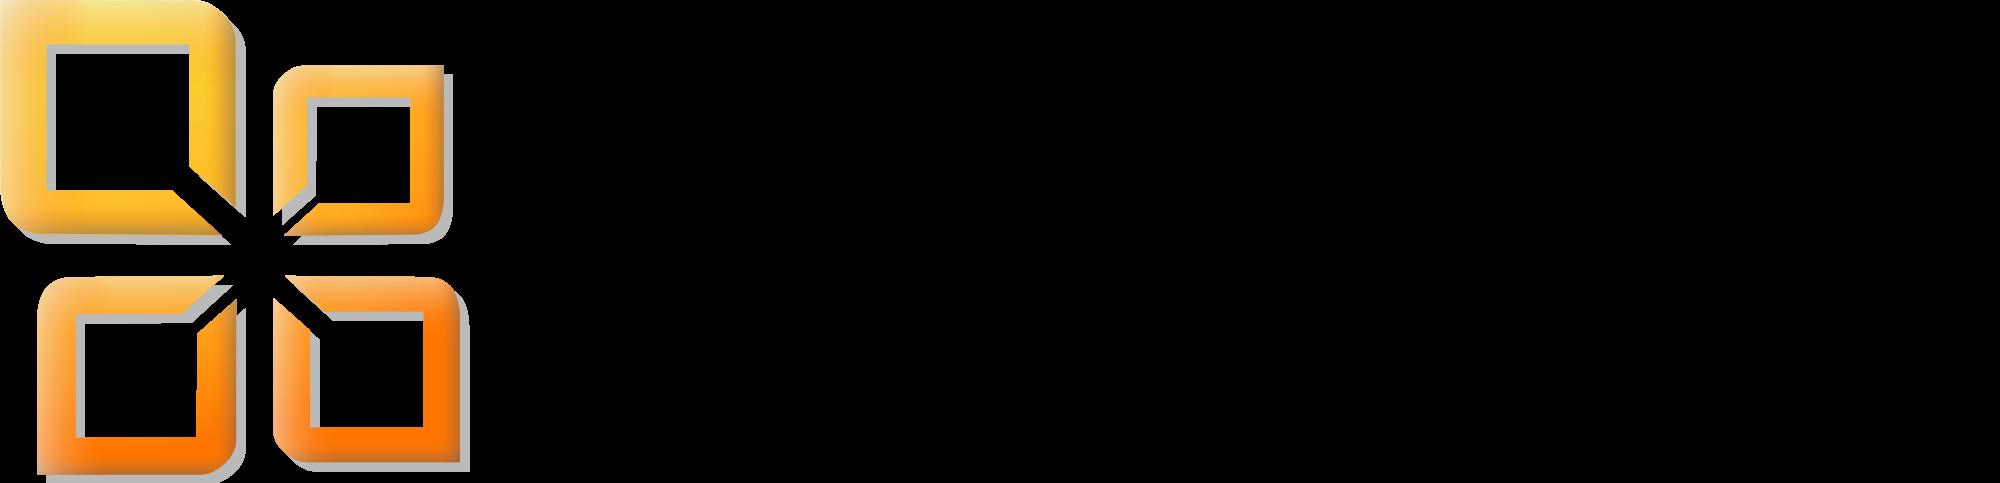 Microsoft_Office2010_logo